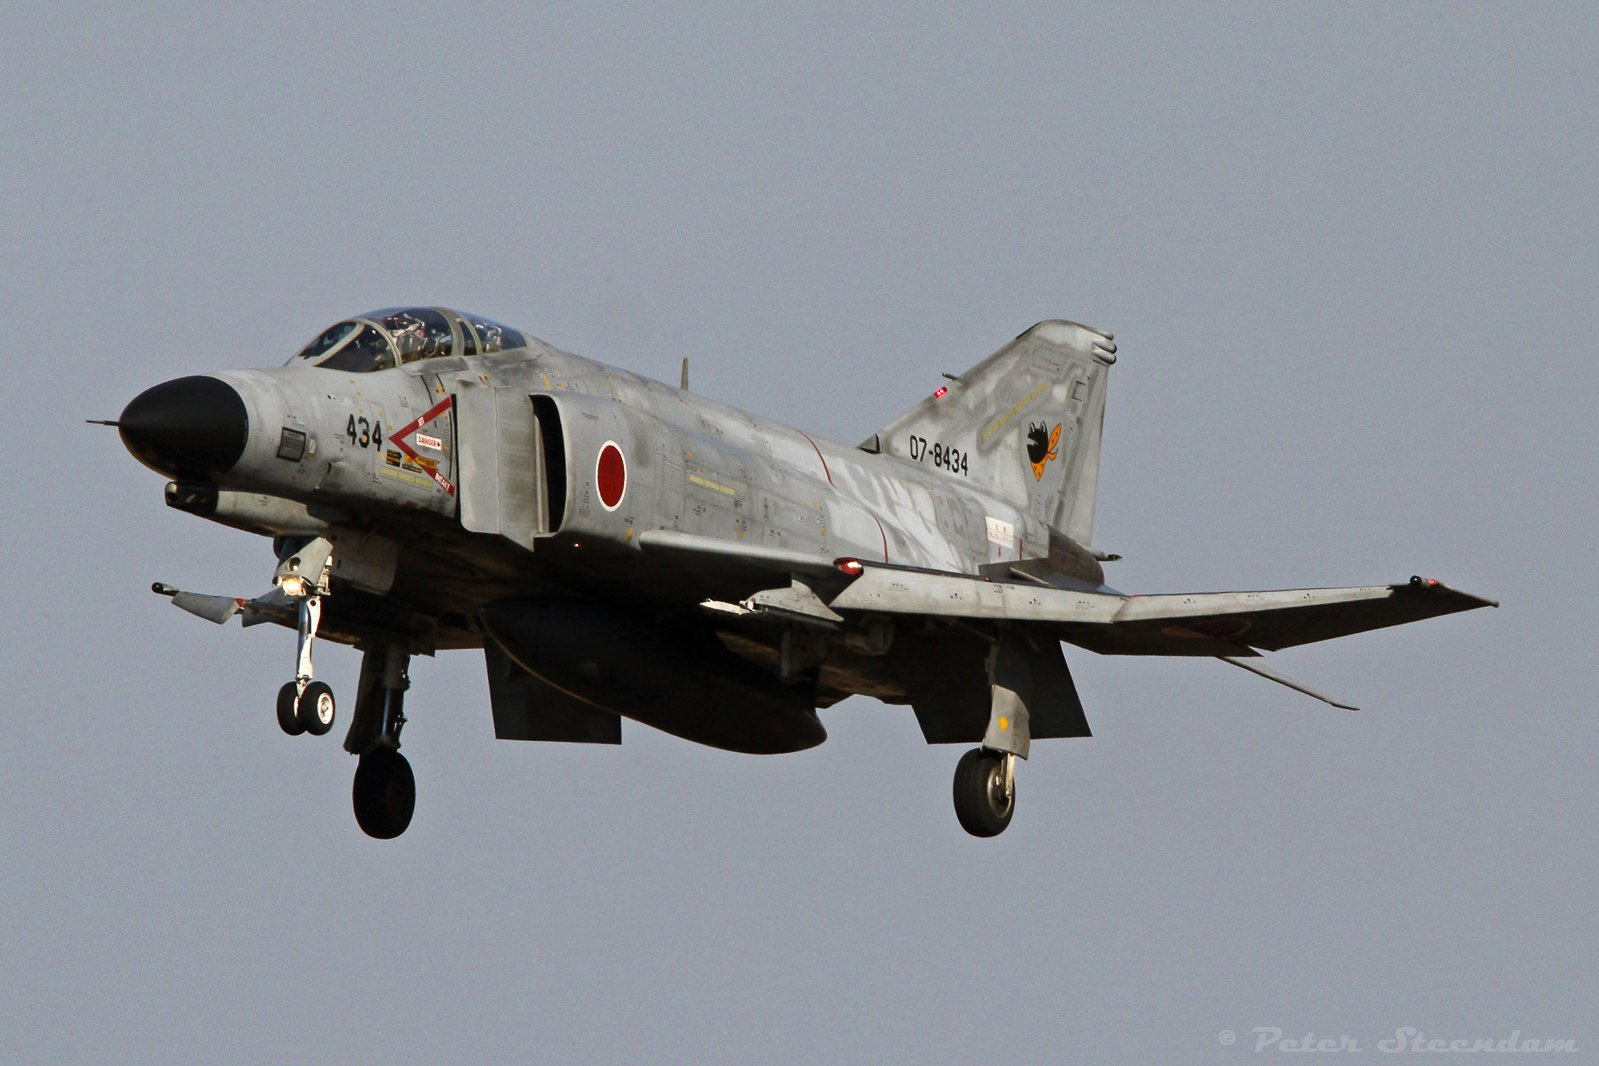 f-4ej-07-8434-301-tfs-landing_mod_fb